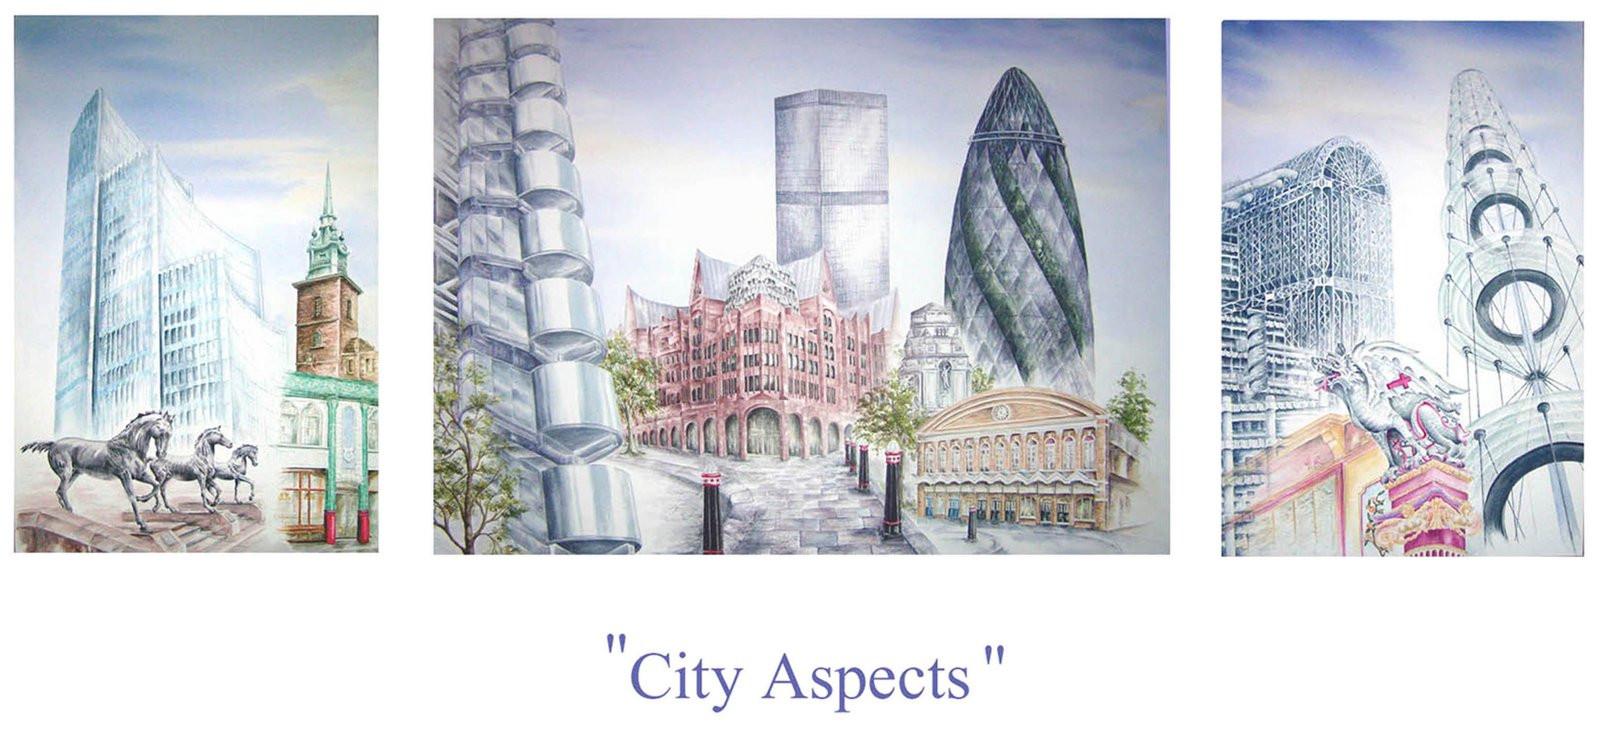 City aspects tryptch